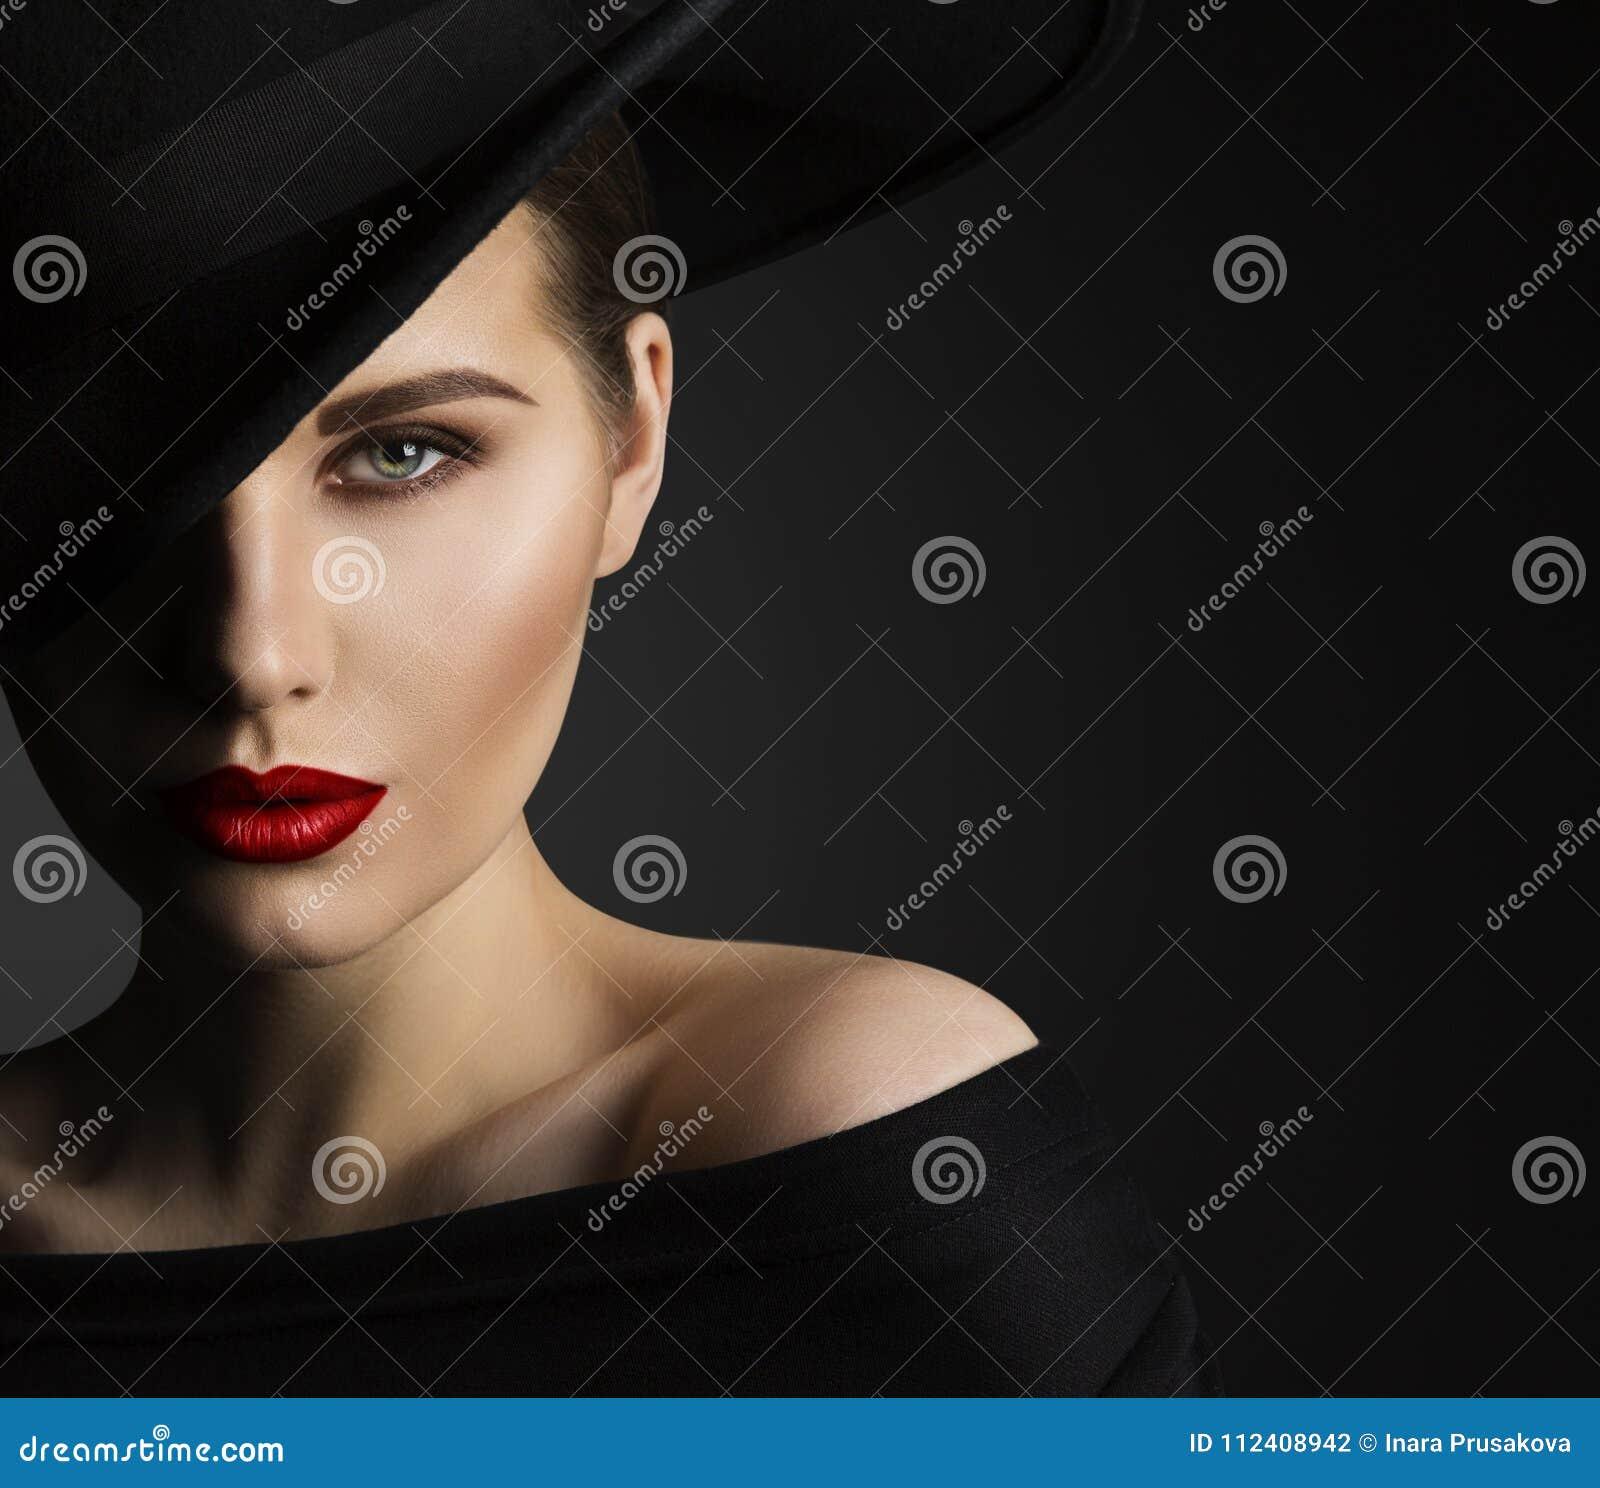 Modelo de moda Beauty Portrait, belleza de la mujer, sombrero negro elegante